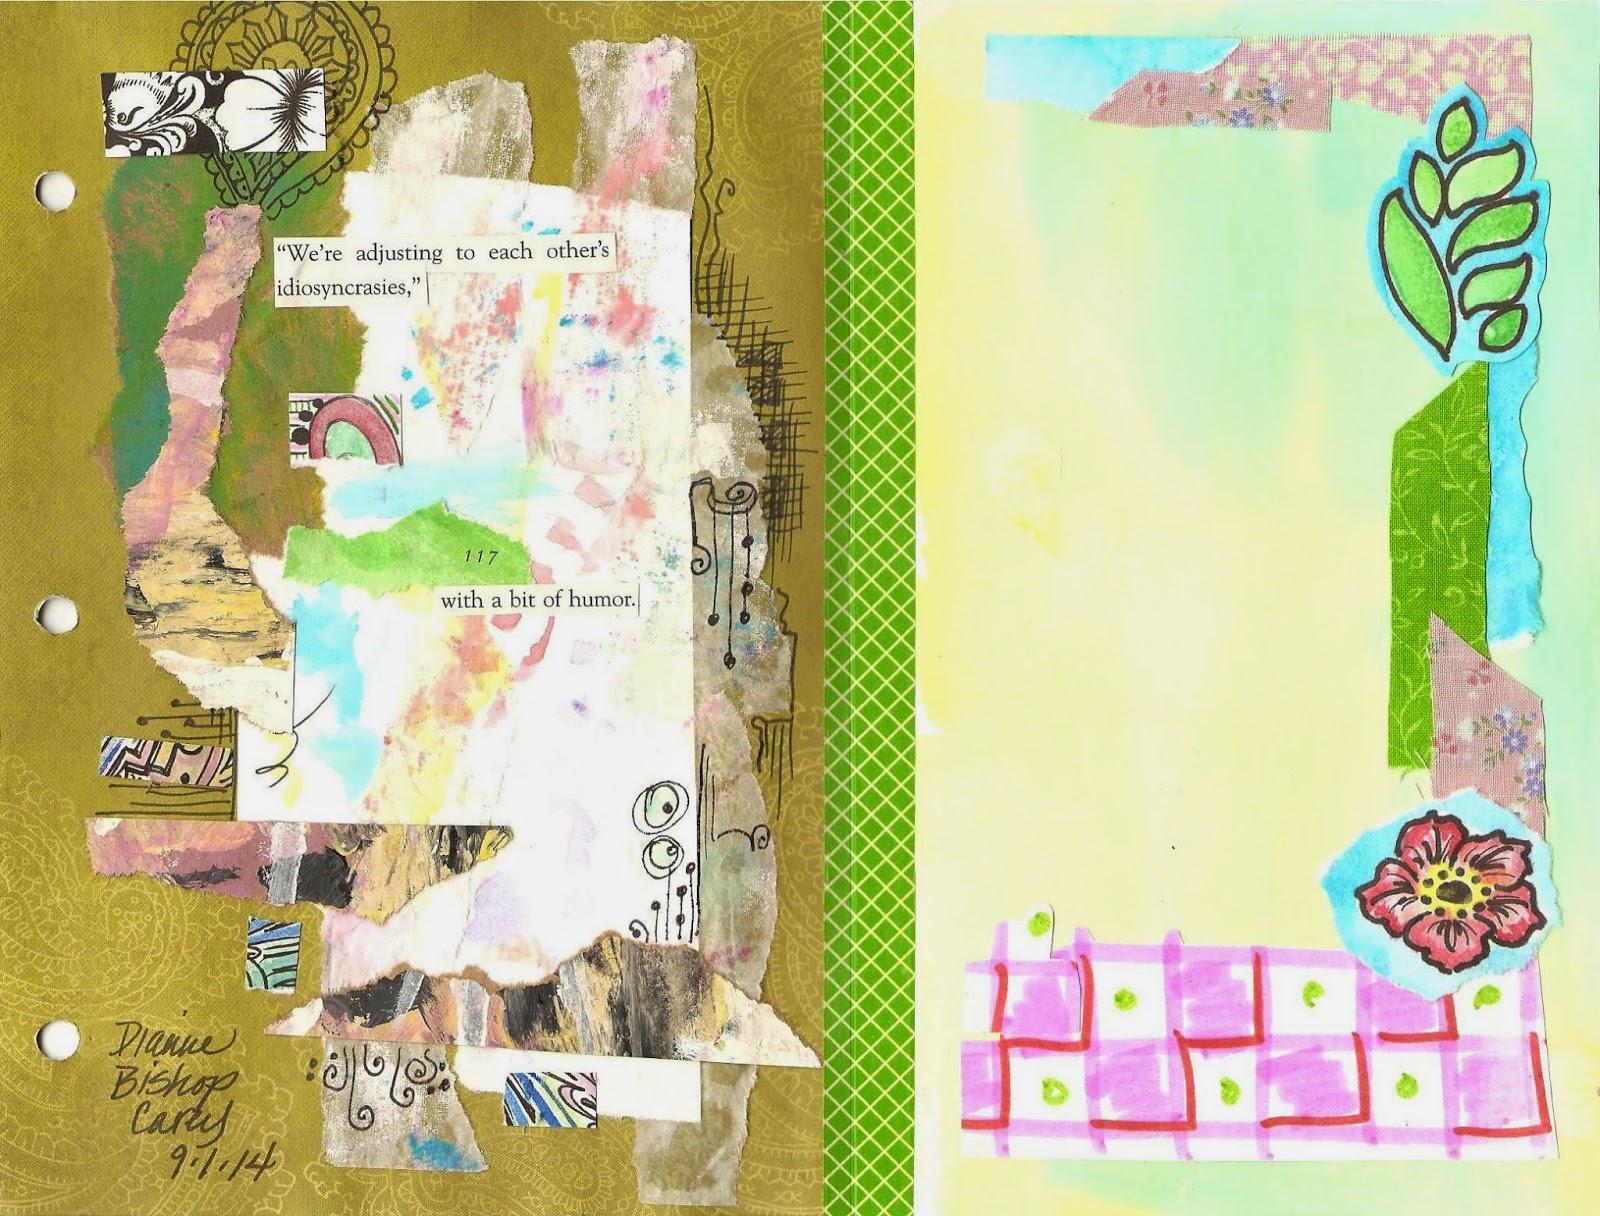 Art Beneath the Cottonwoods: September 2014